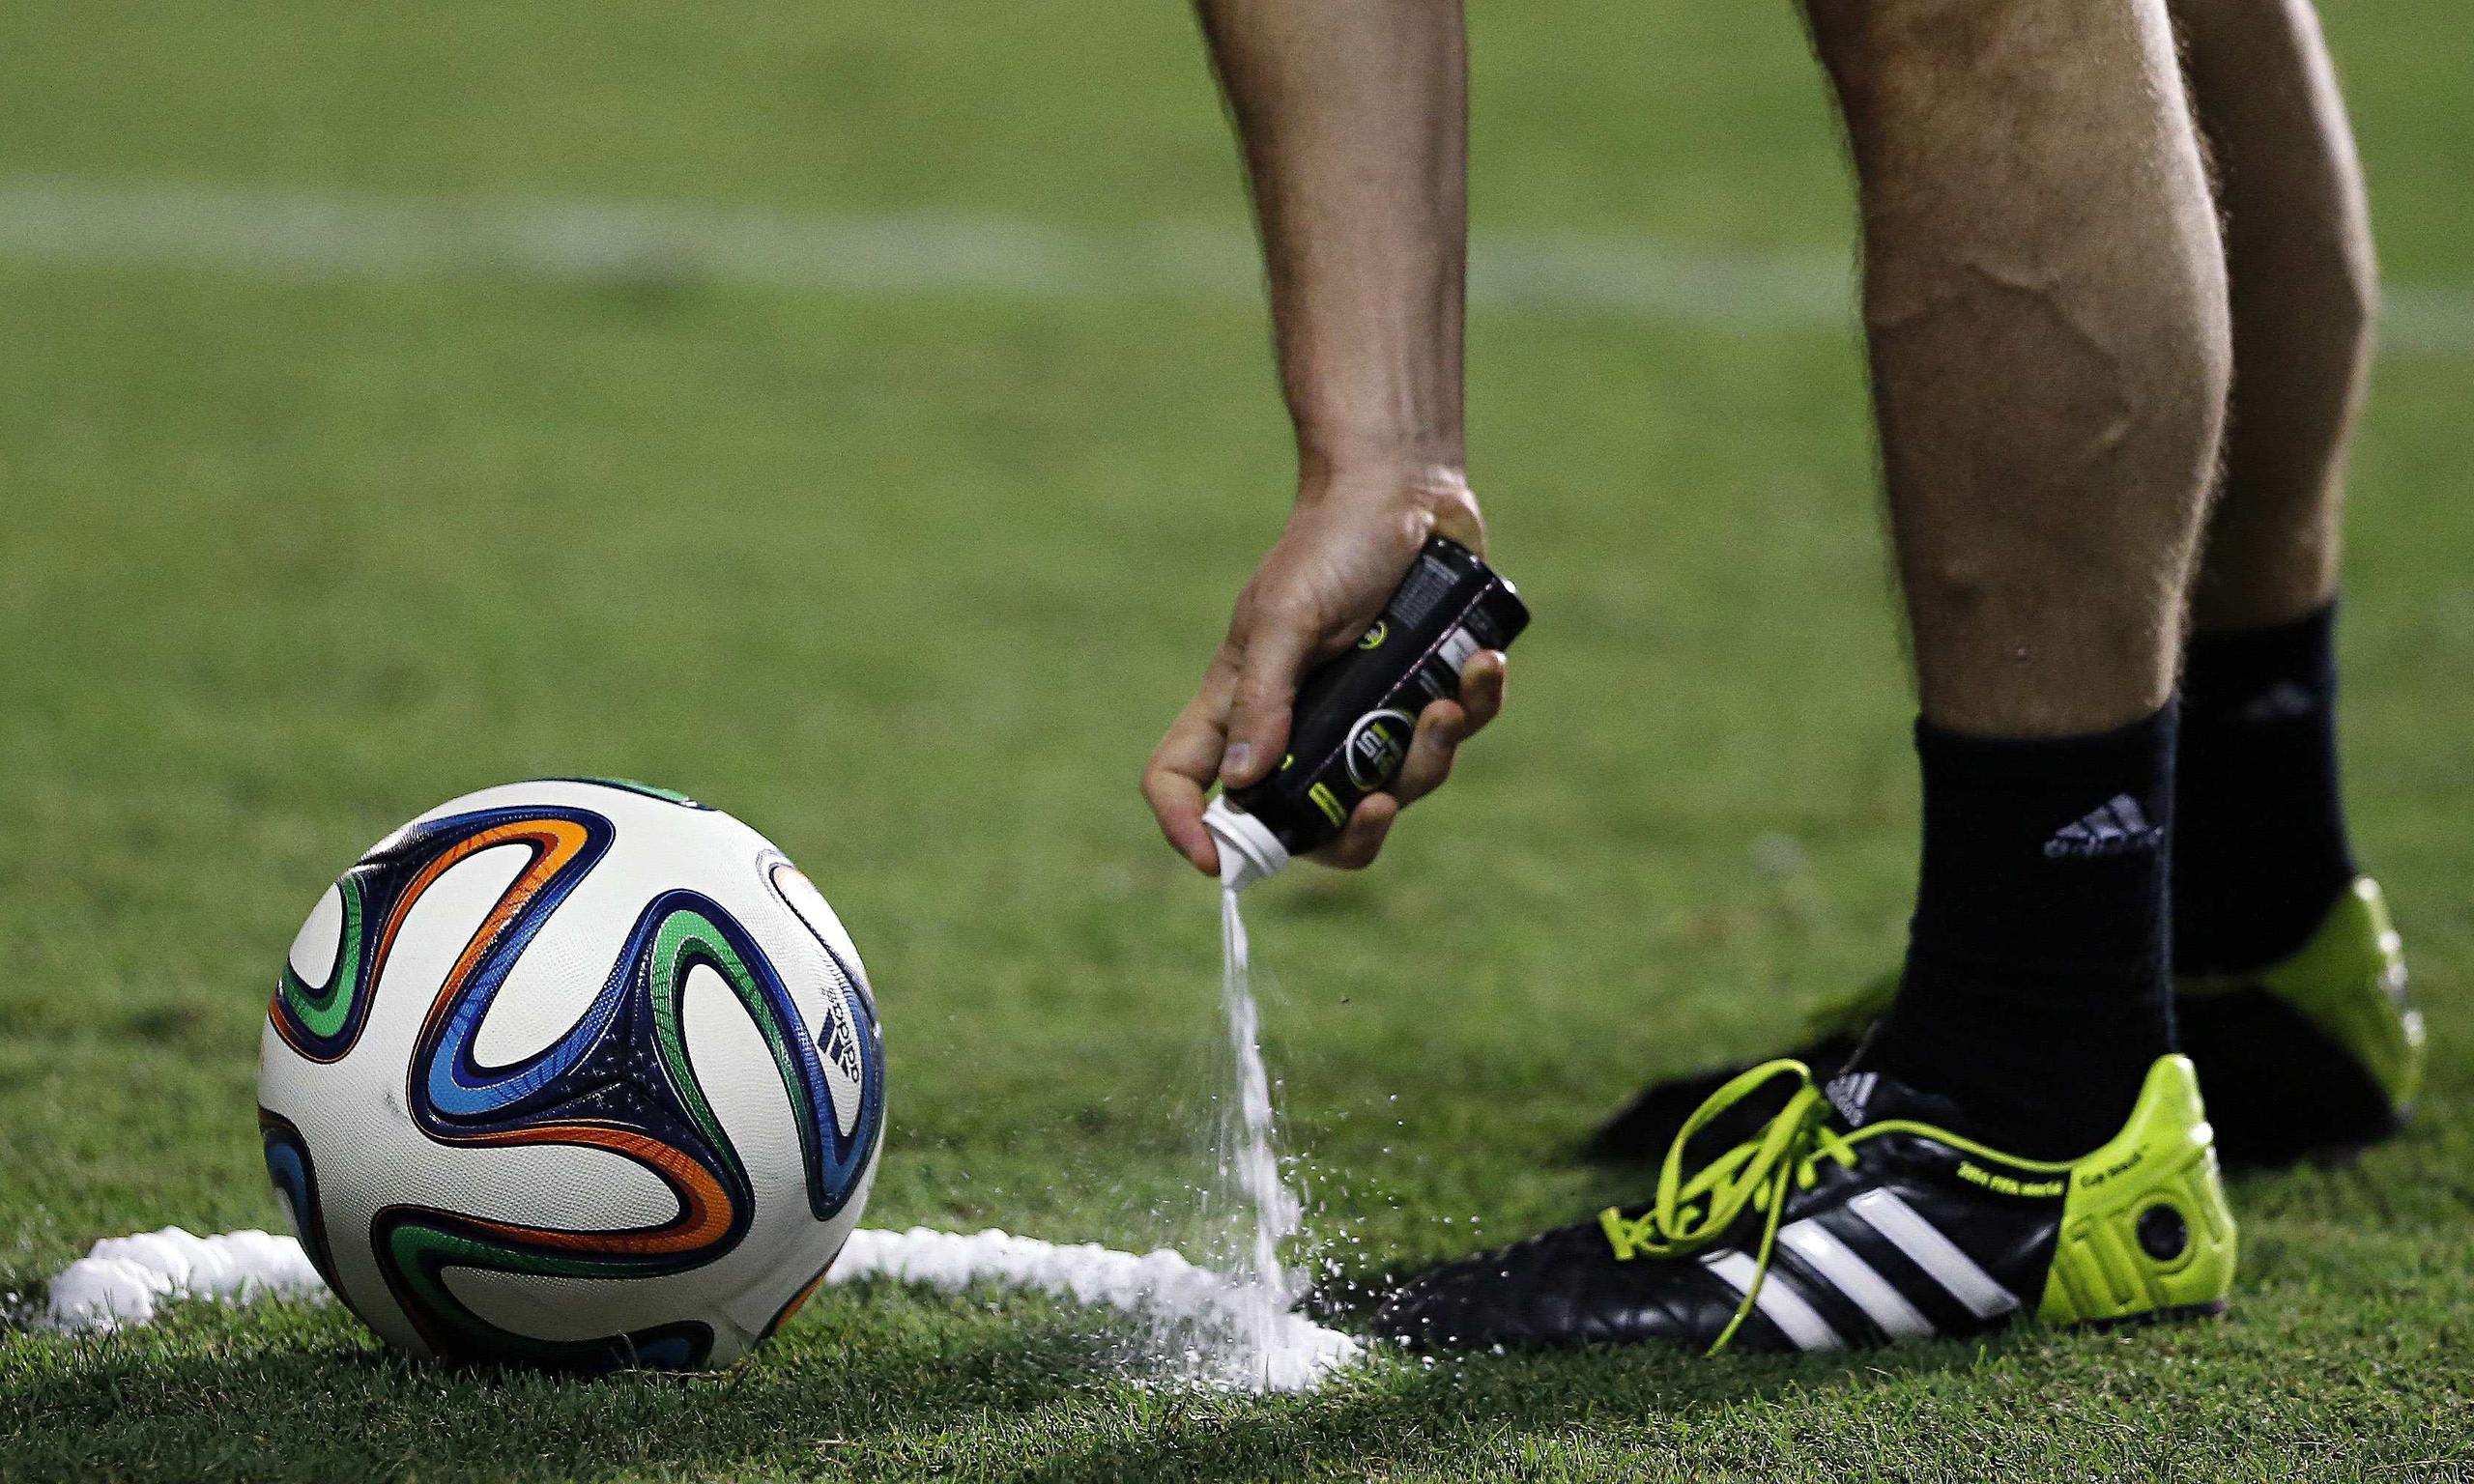 S Ray Football Premier League referee...